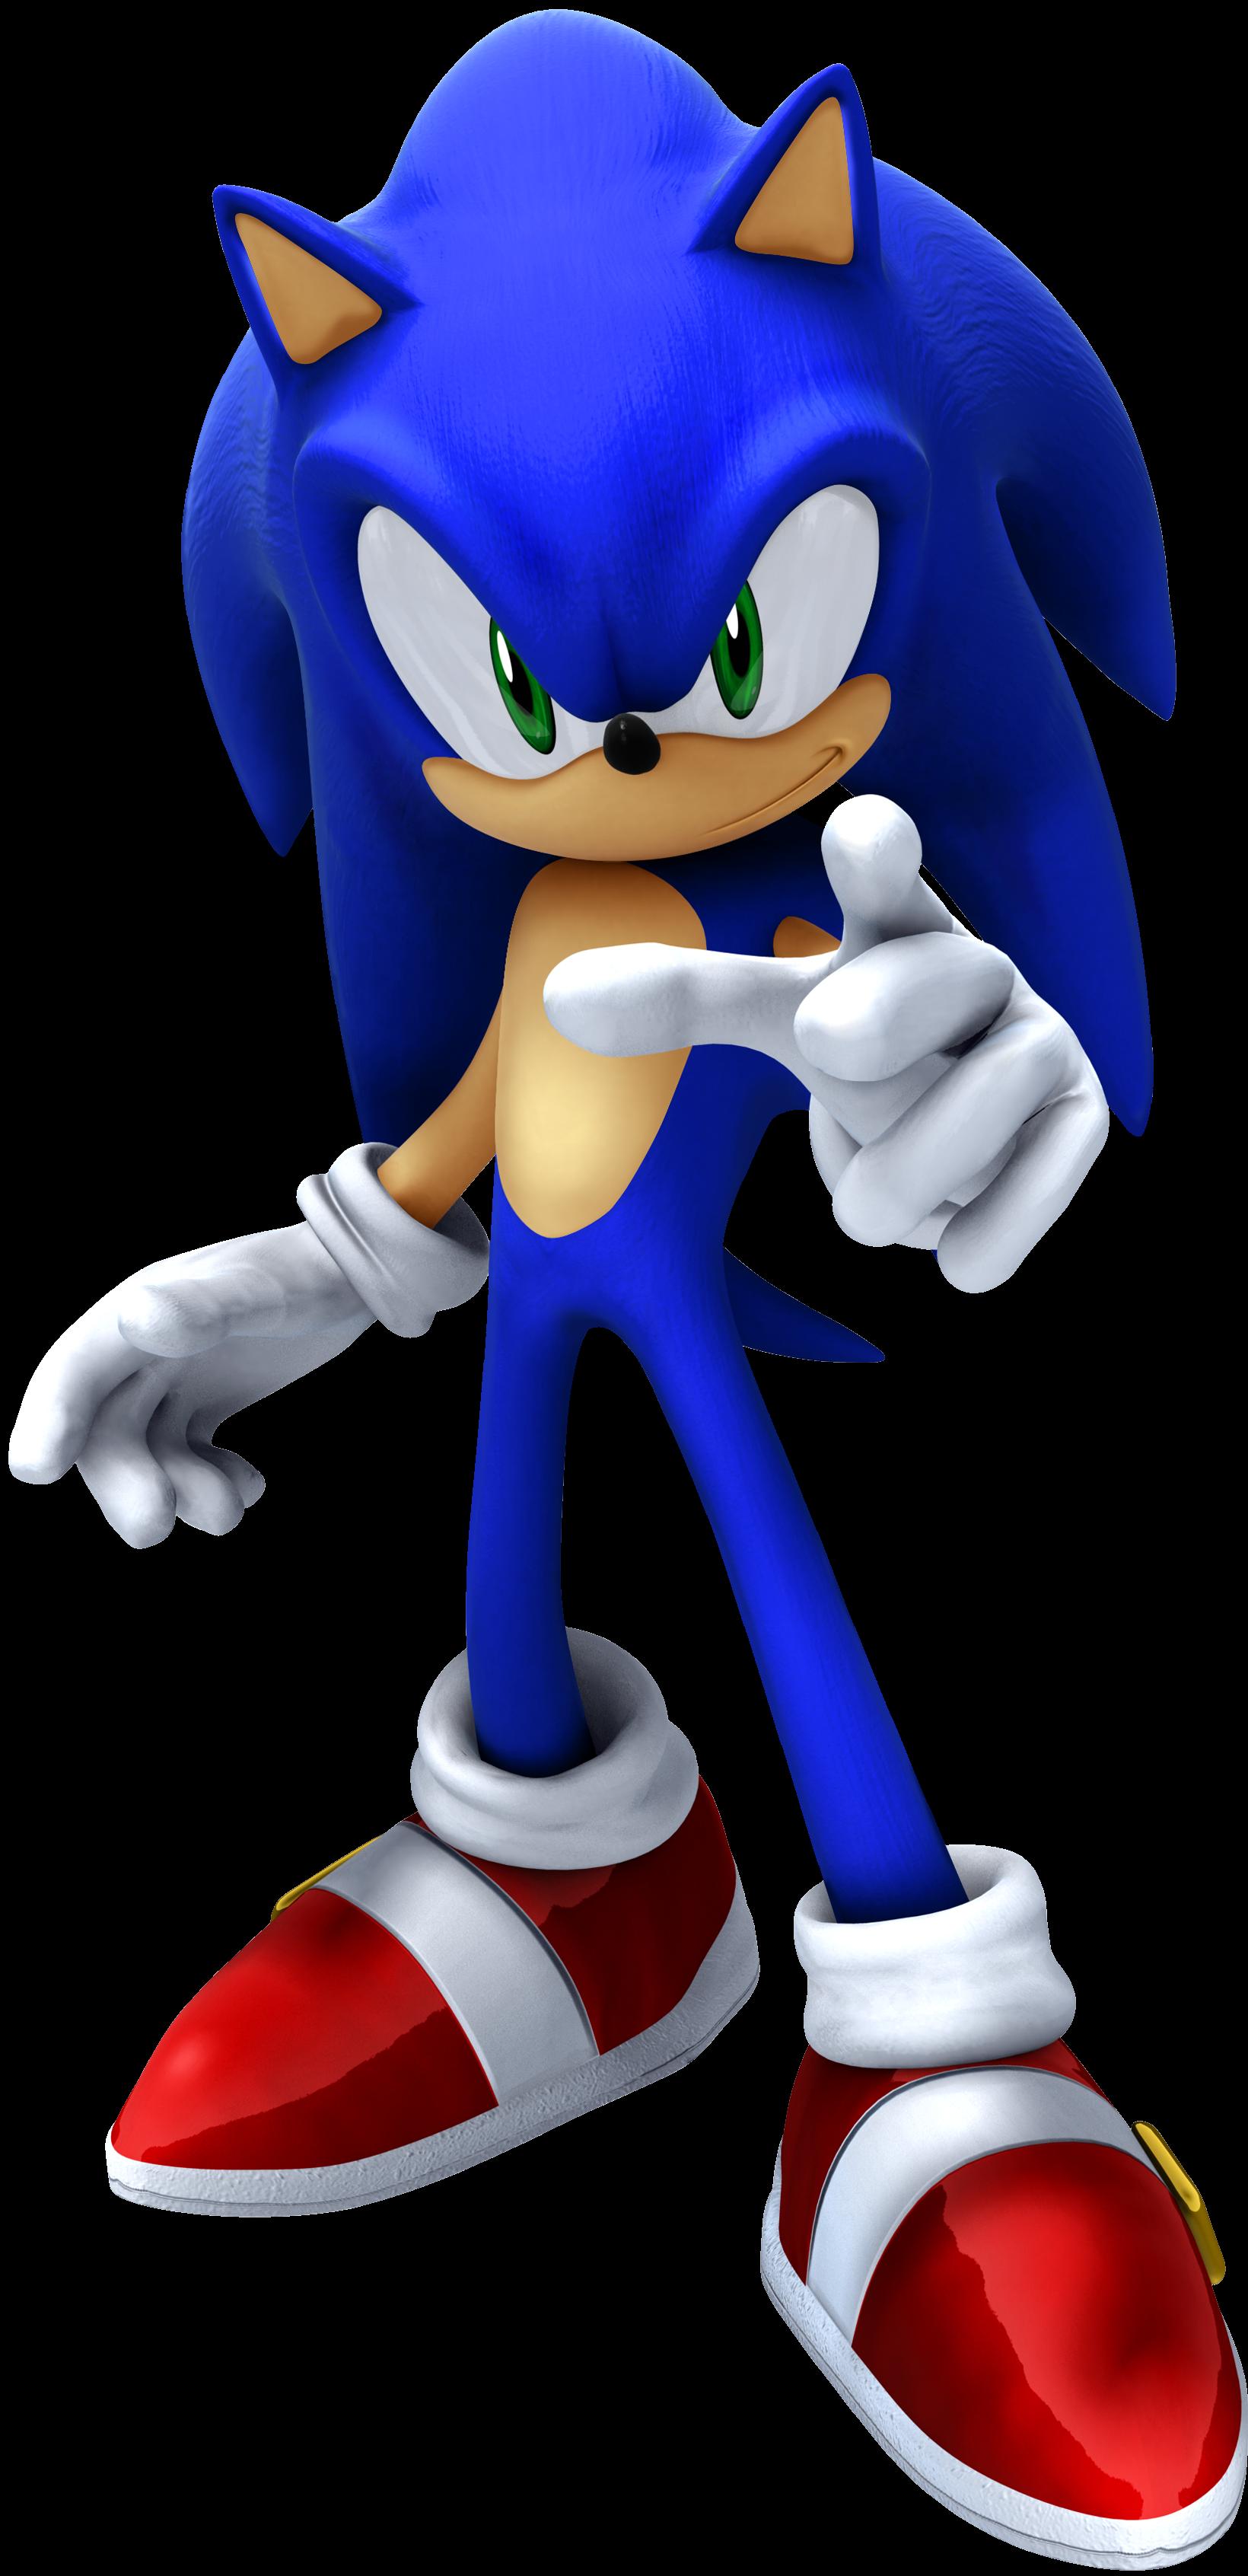 sonic the hedgehog - photo #27